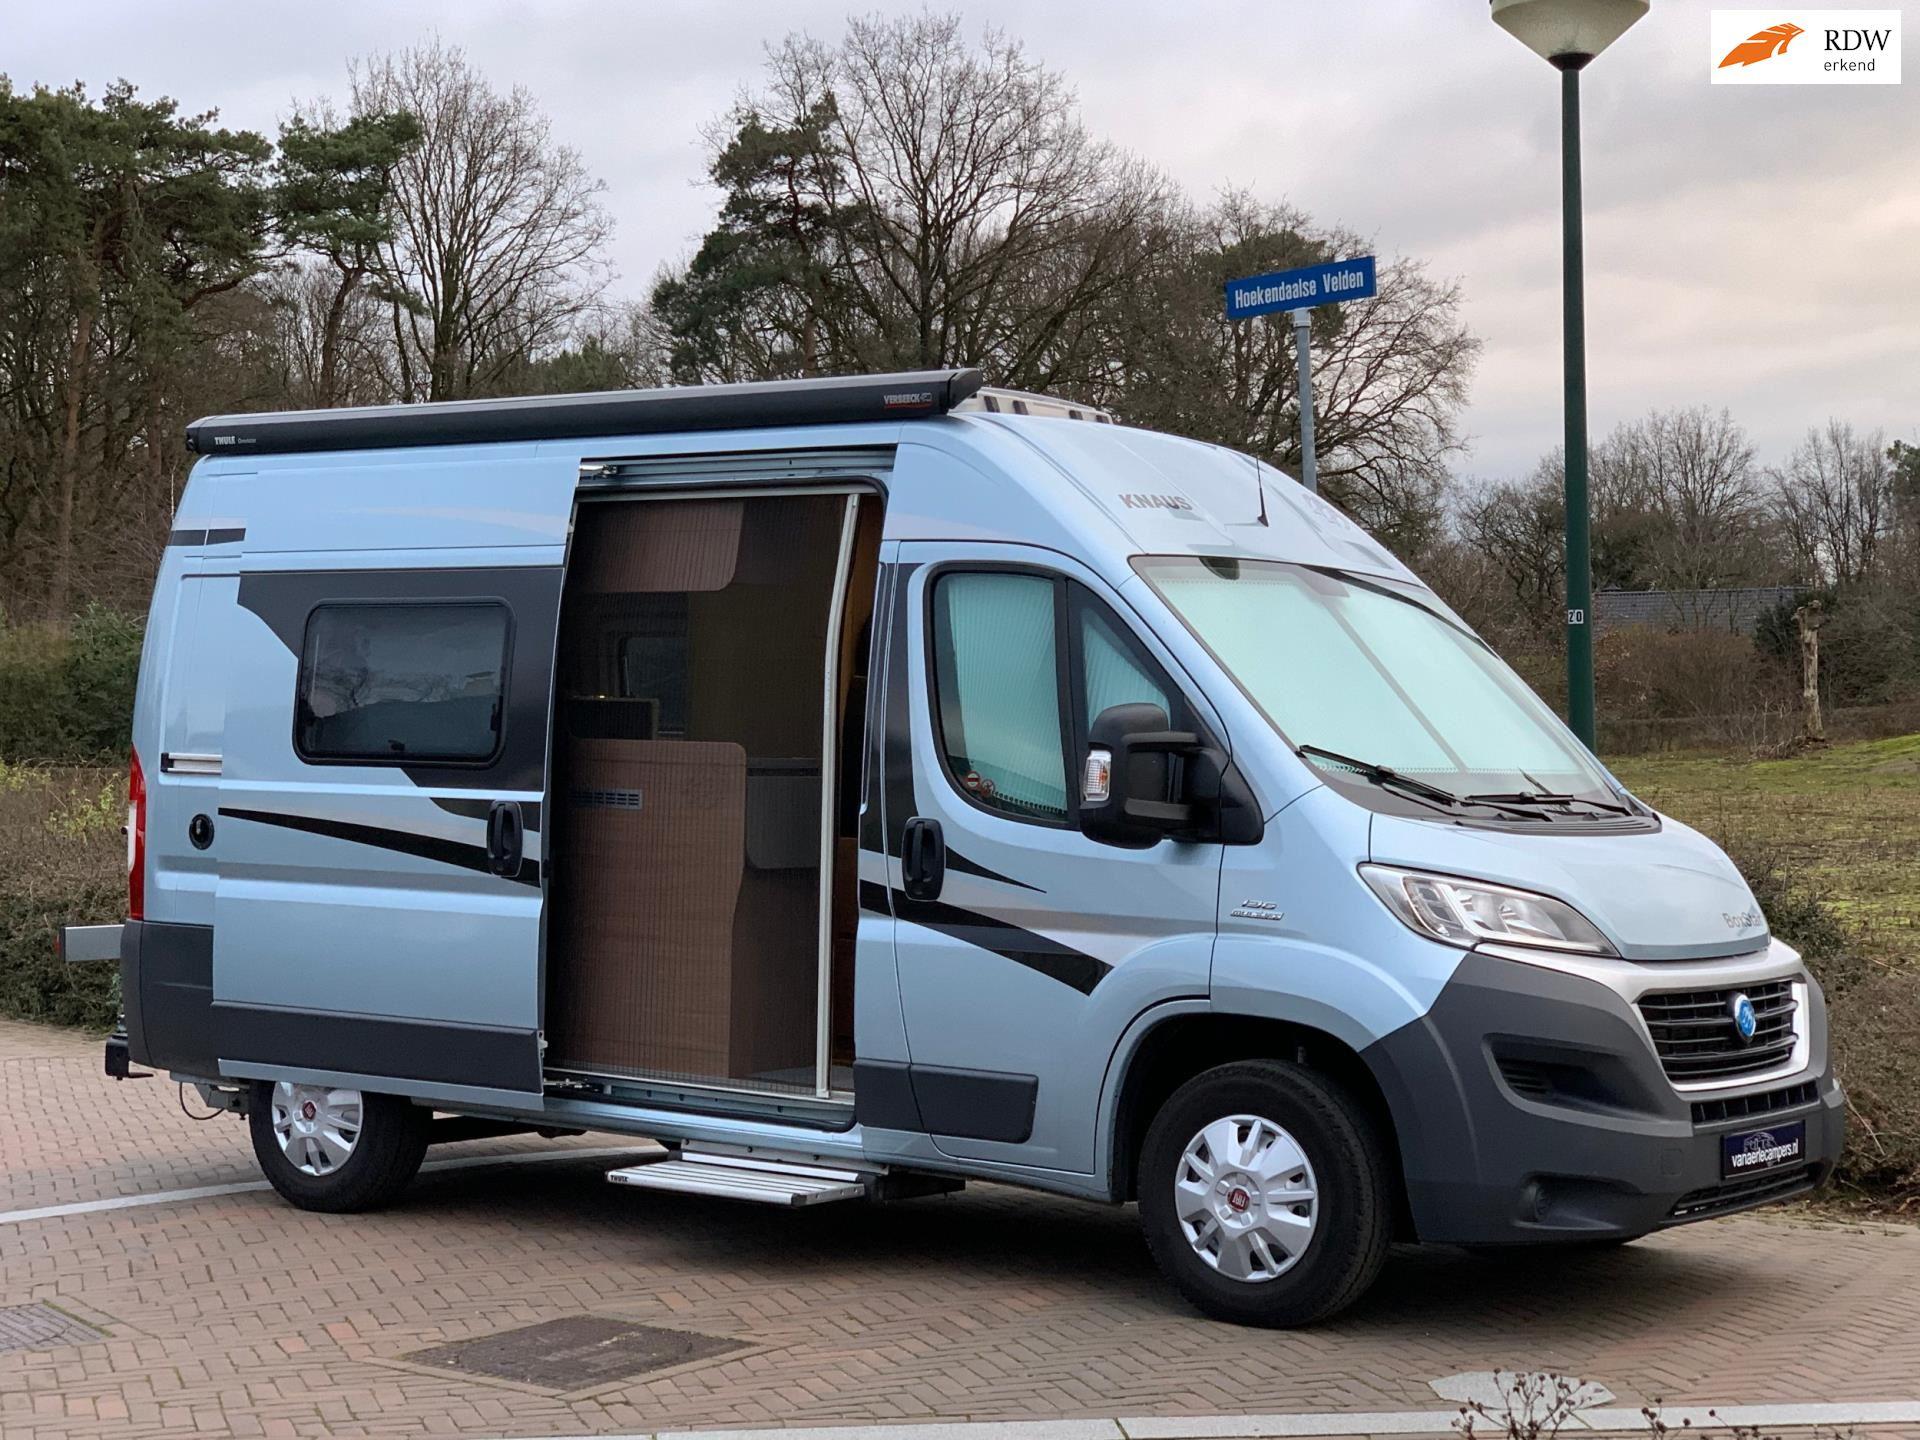 Knaus Boxstar Road 540 lang-04-2015-Nieuwst-1e Eig.-Compacte Buscamper occasion - Eric van Aerle Auto's